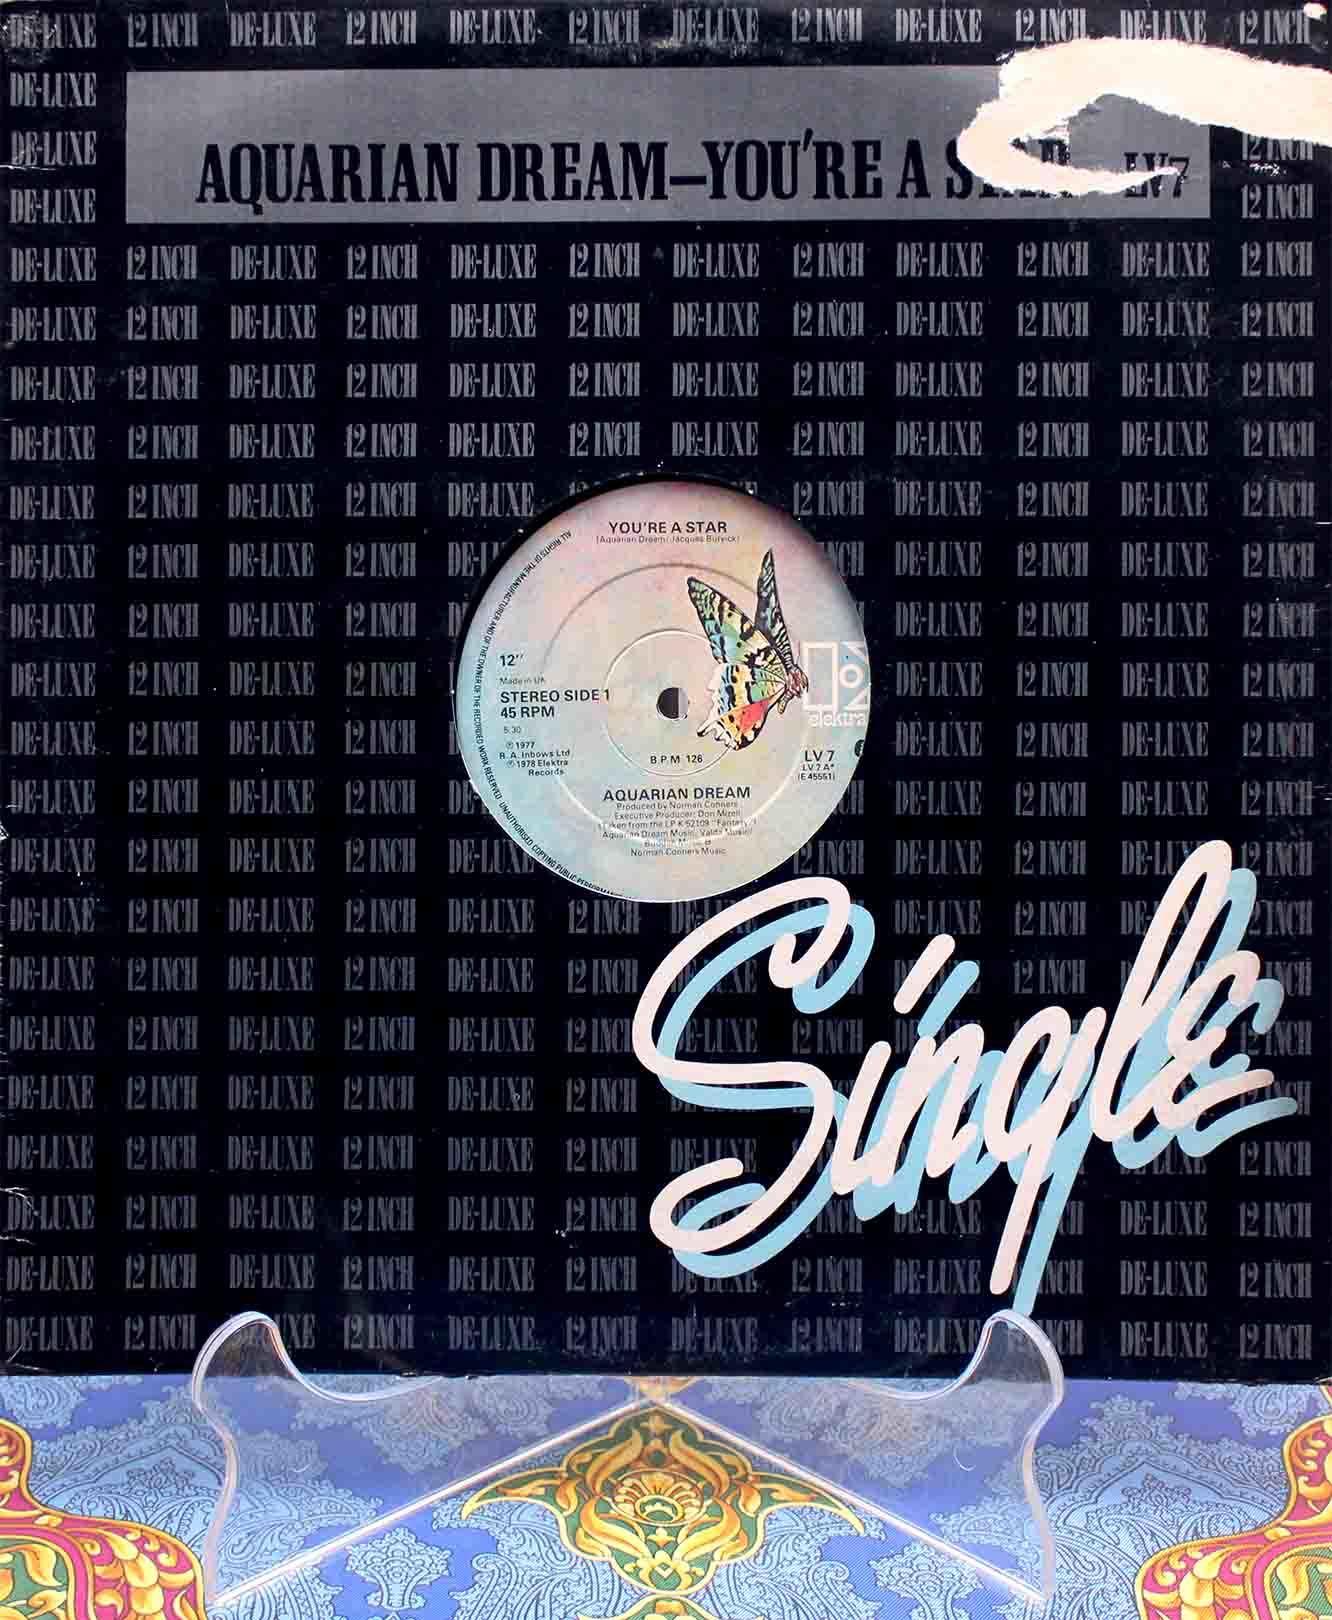 Aquarian Dream – Youre A Star 01